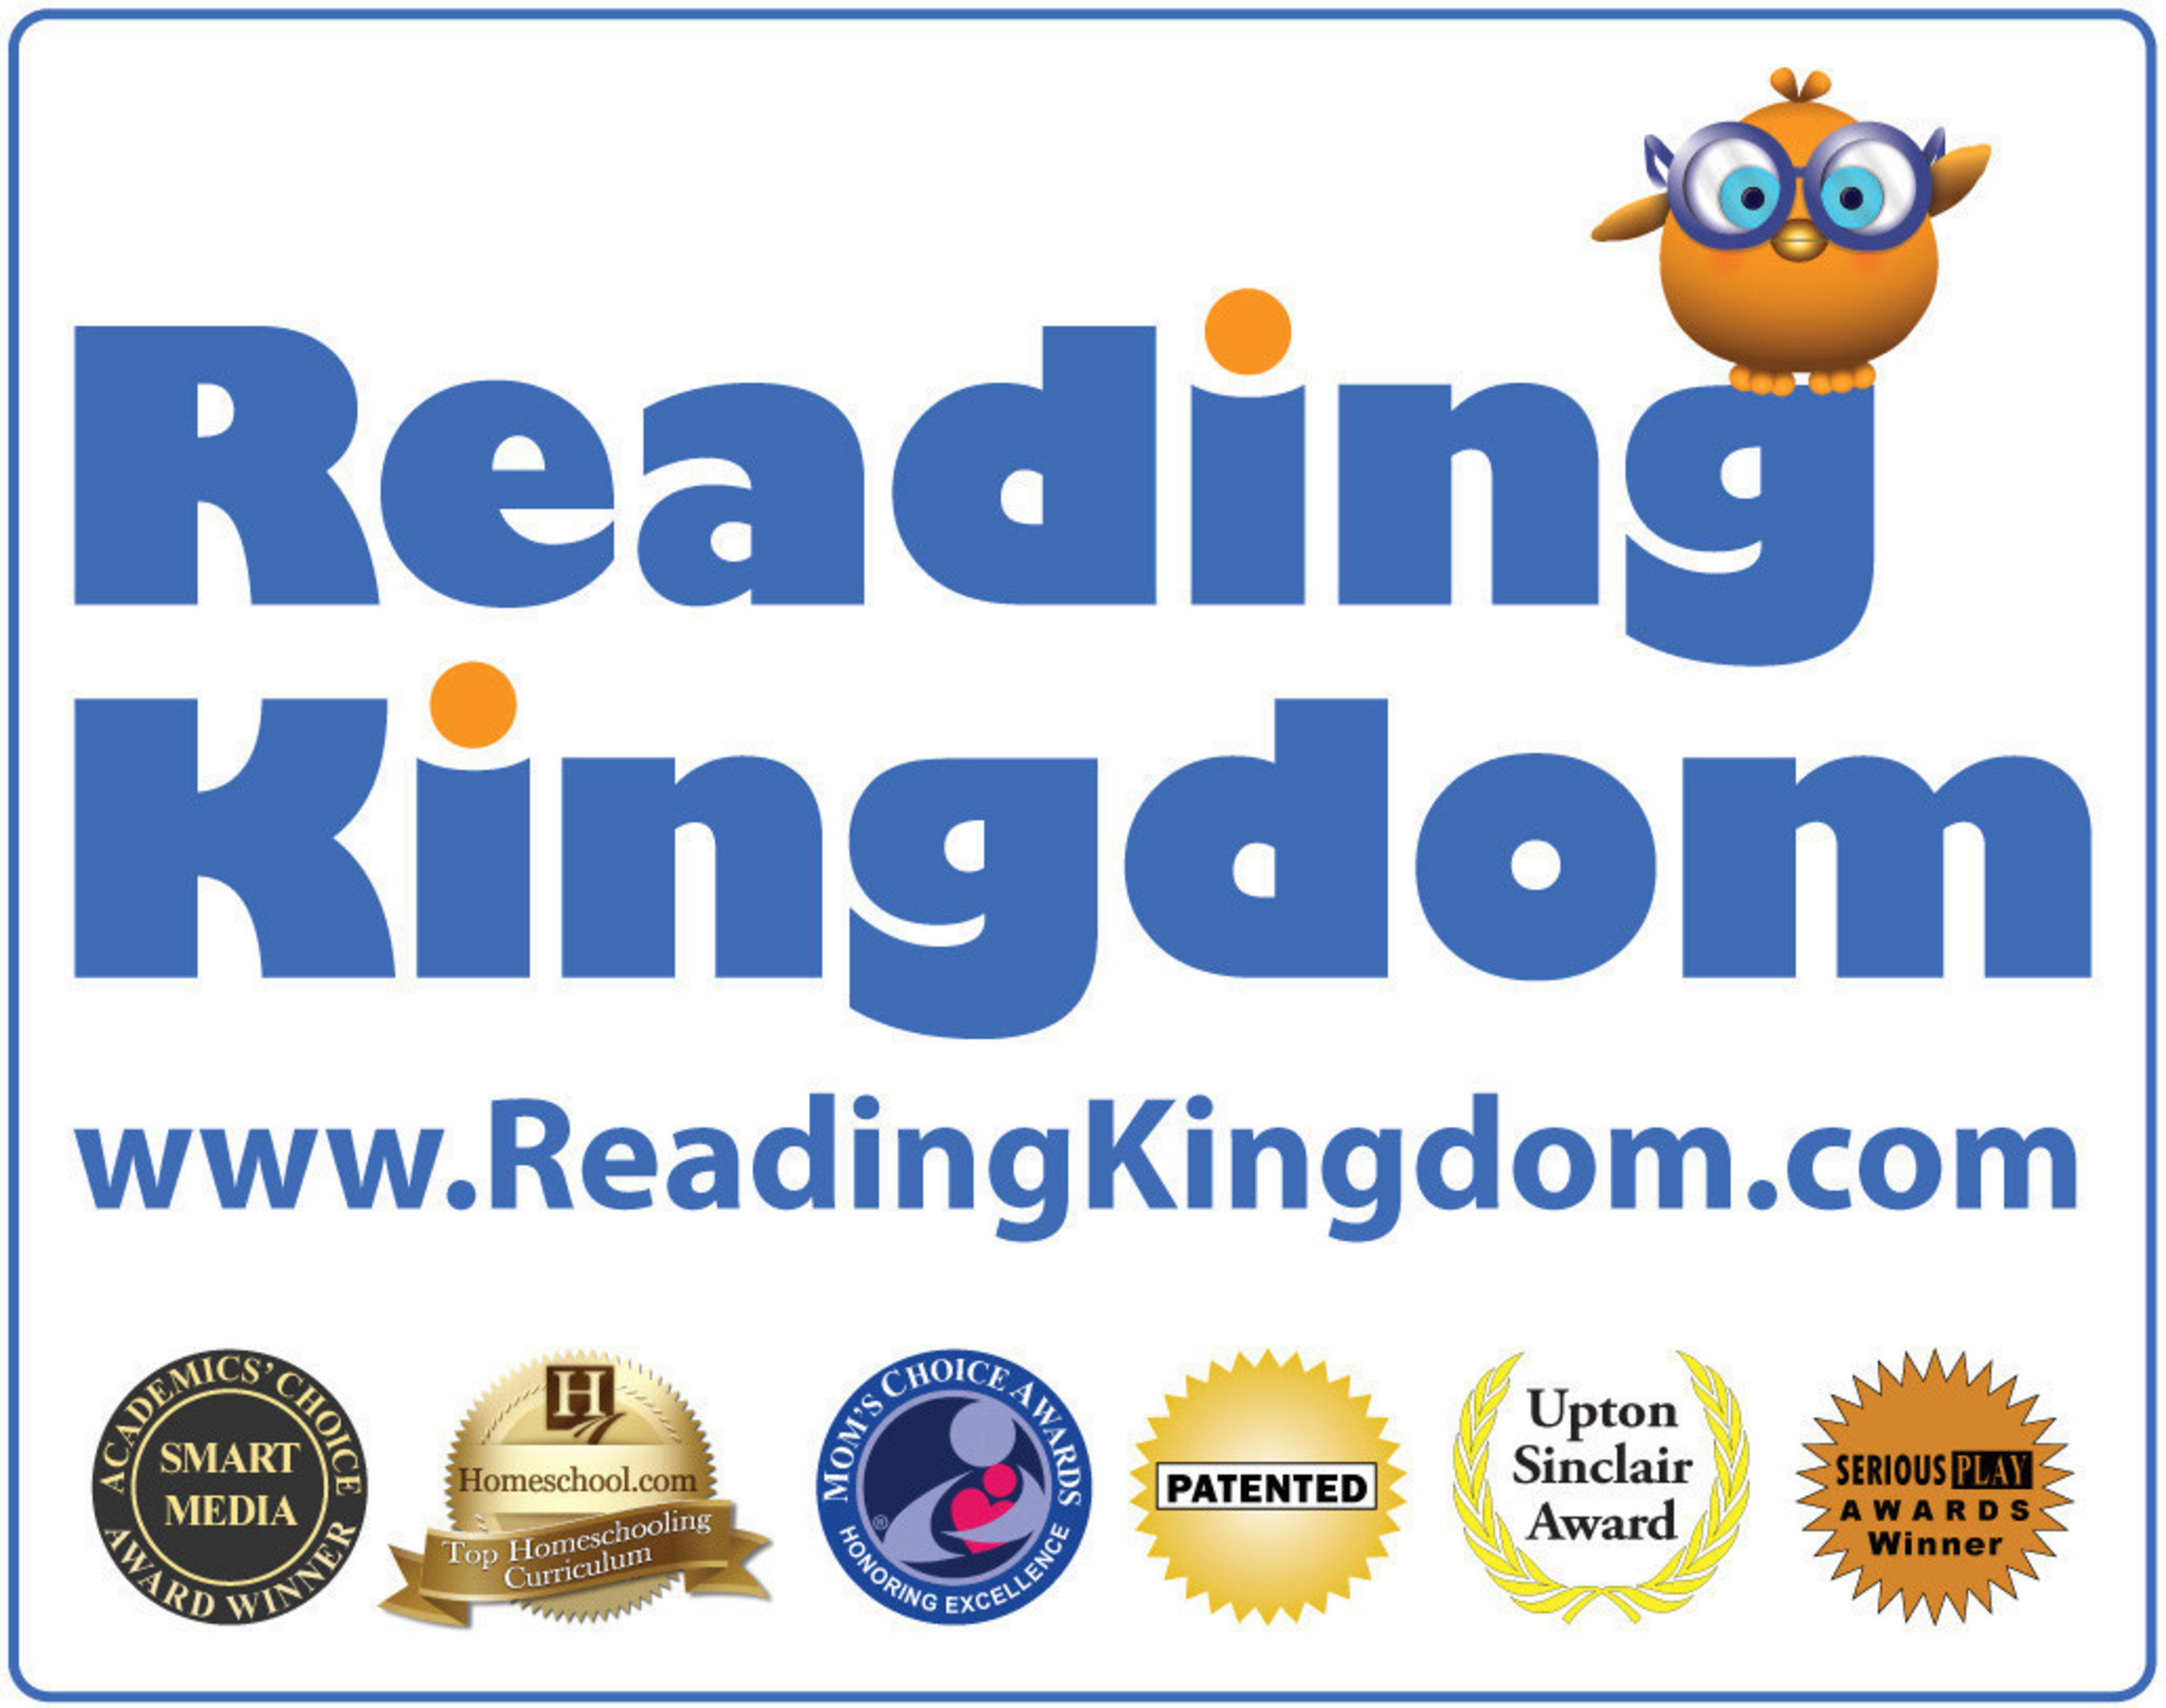 Reading Kingdom Online Reading Program Wins Academics' Choice Smart Media Award for Mind-Building